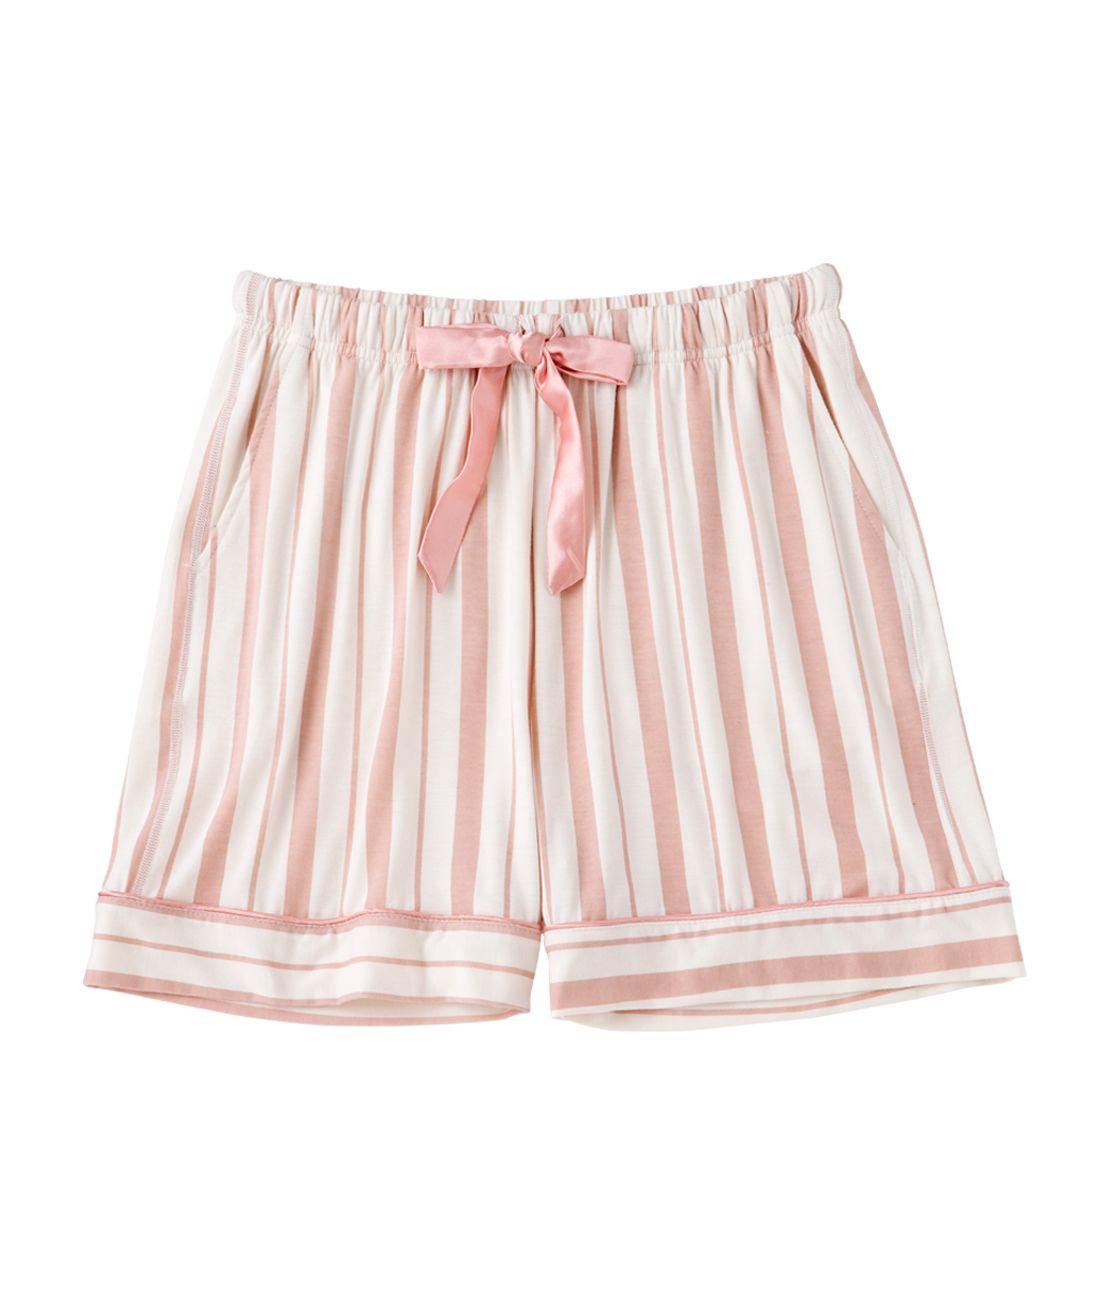 PICK&MIX短裤